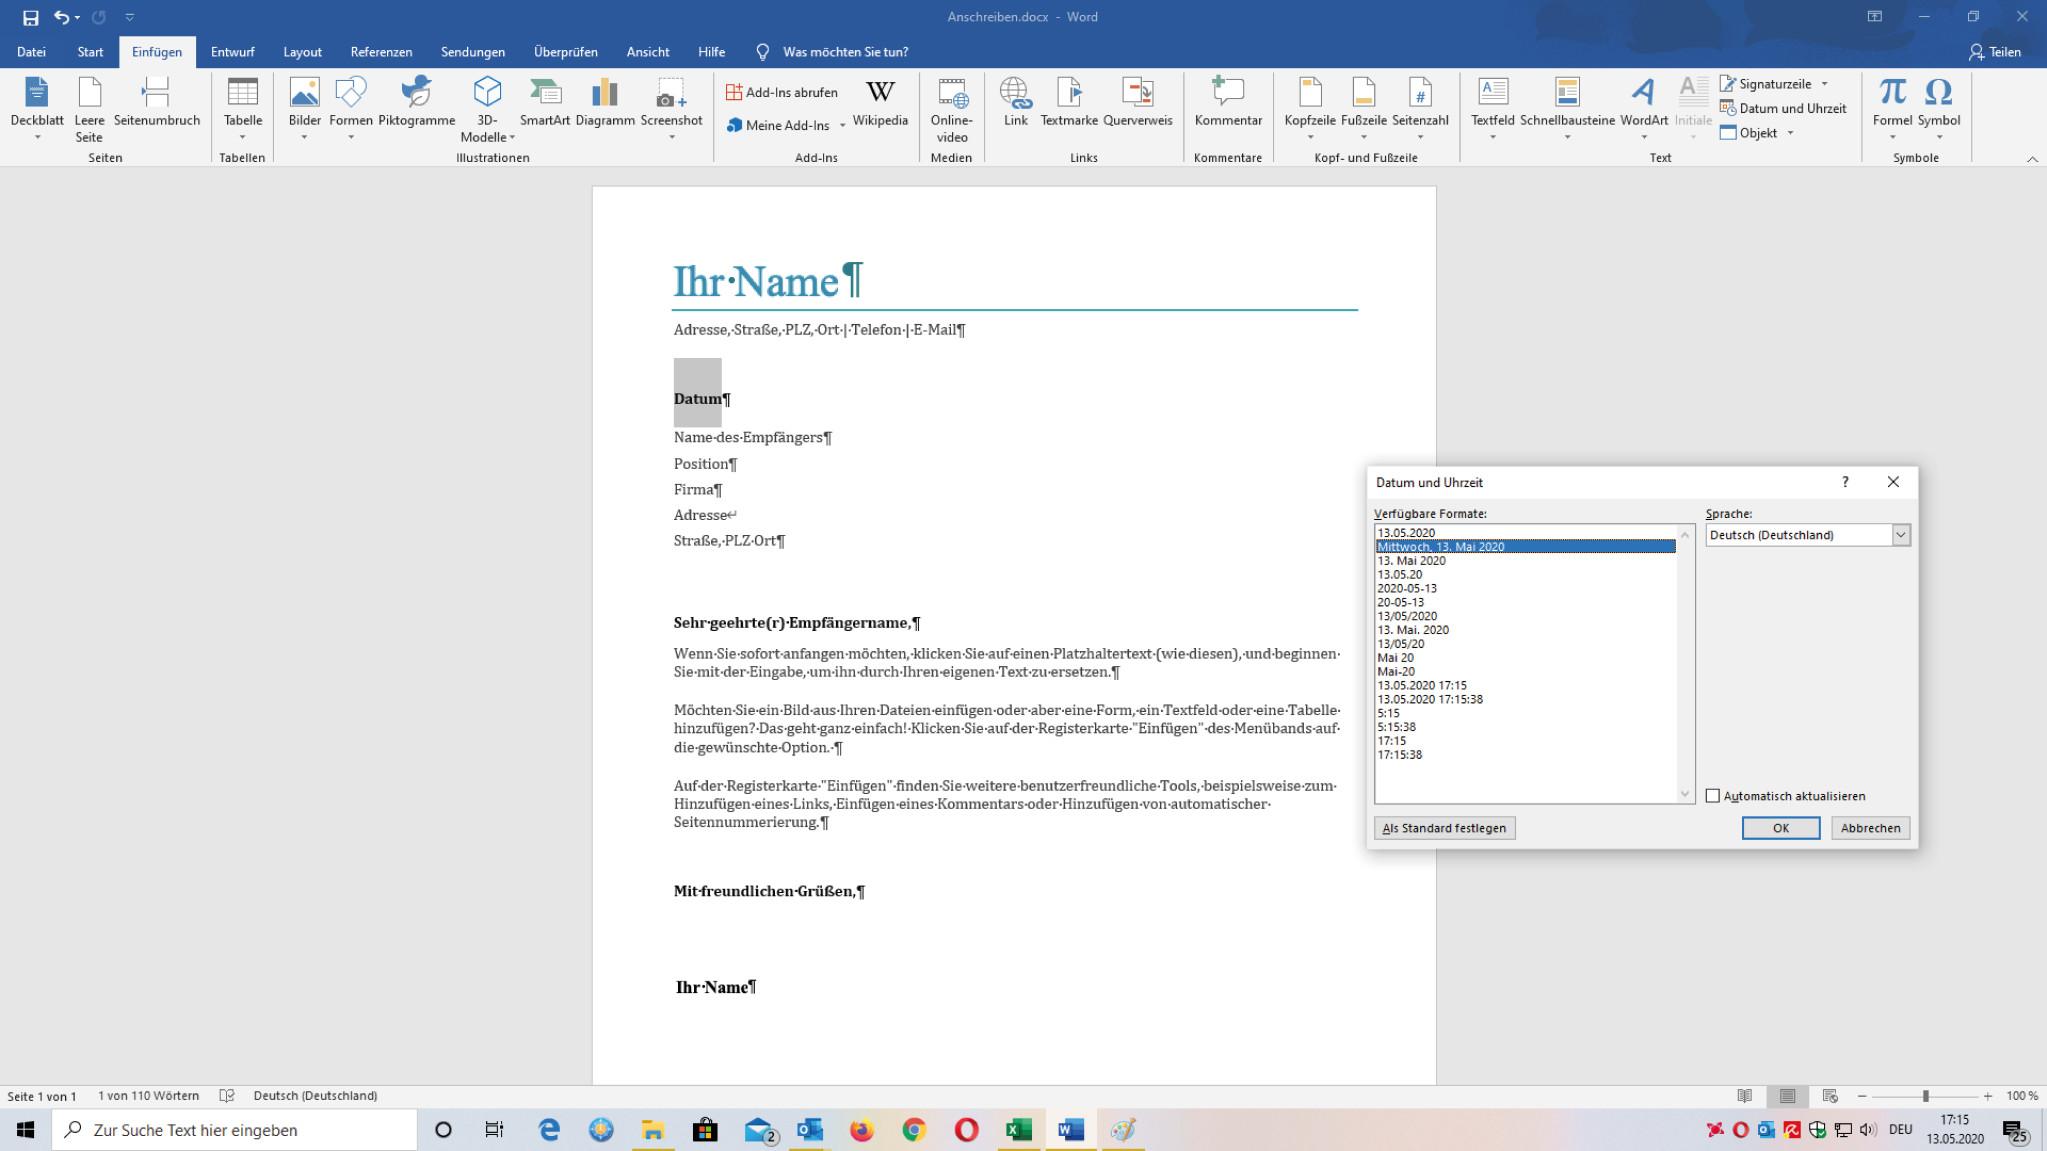 Screenshot 1 - Microsoft 365 (Office 365)